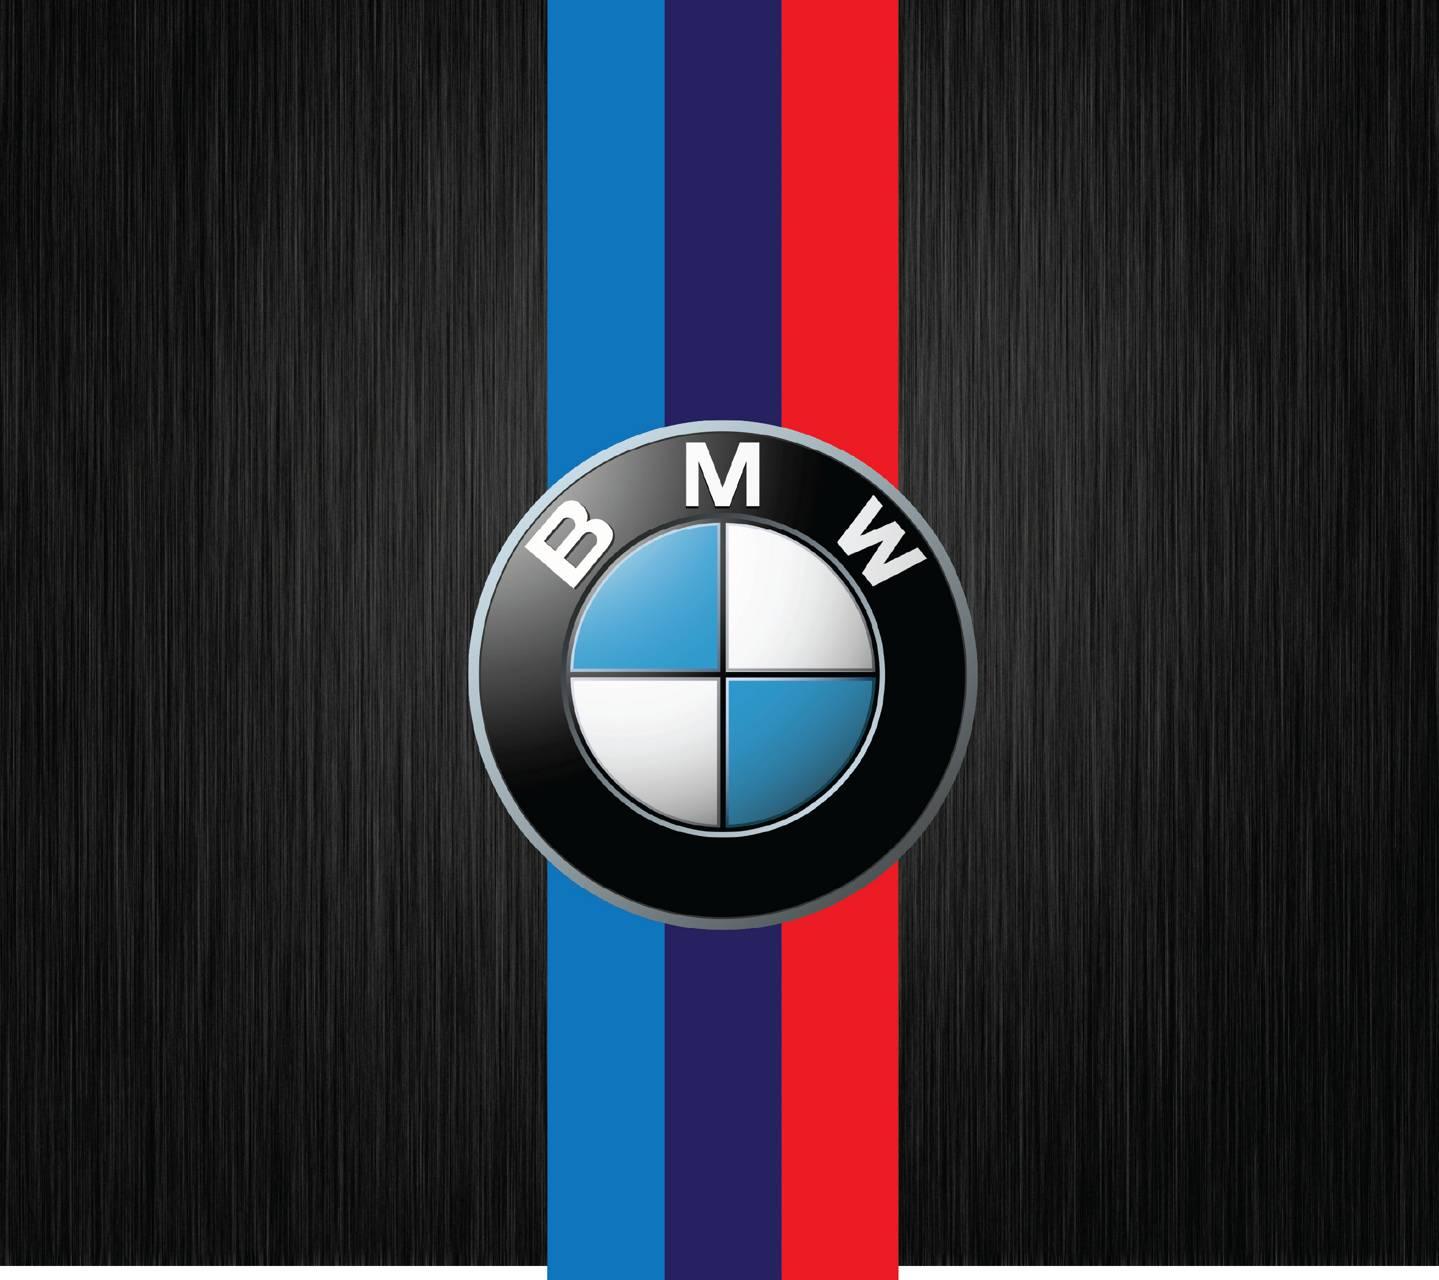 BMW Logo wallpaper by jamesluce2 - 5a - Free on ZEDGE™